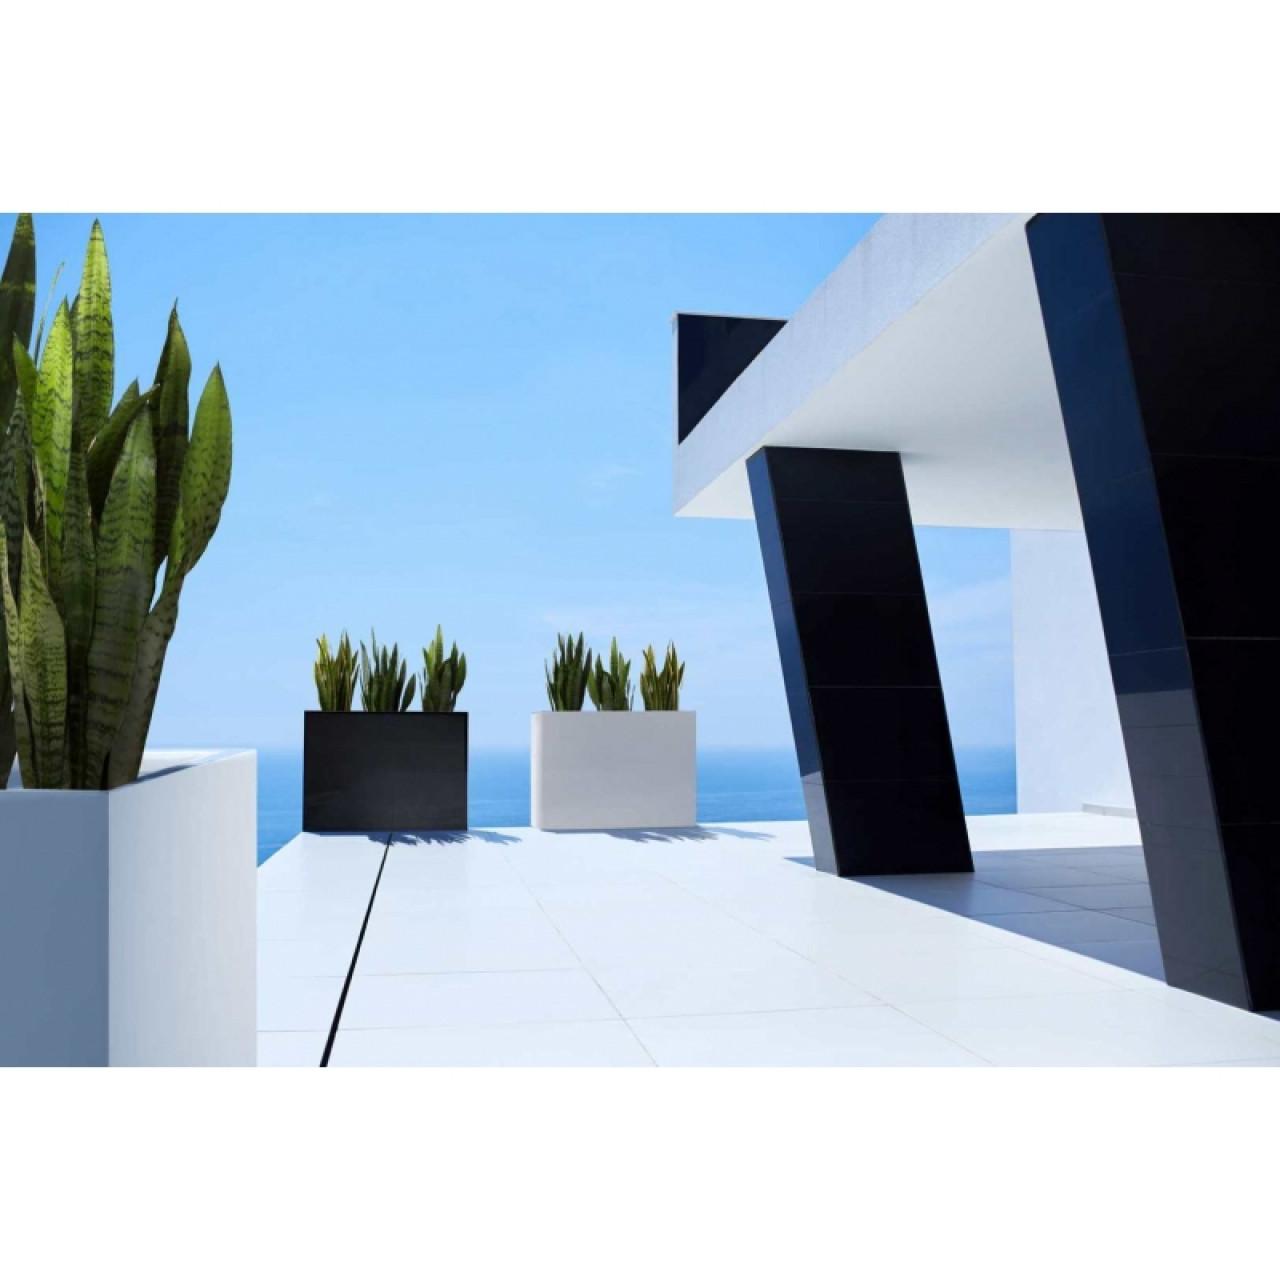 Donica Fiberglass 500 x 200 x 500 mm 95.011.50